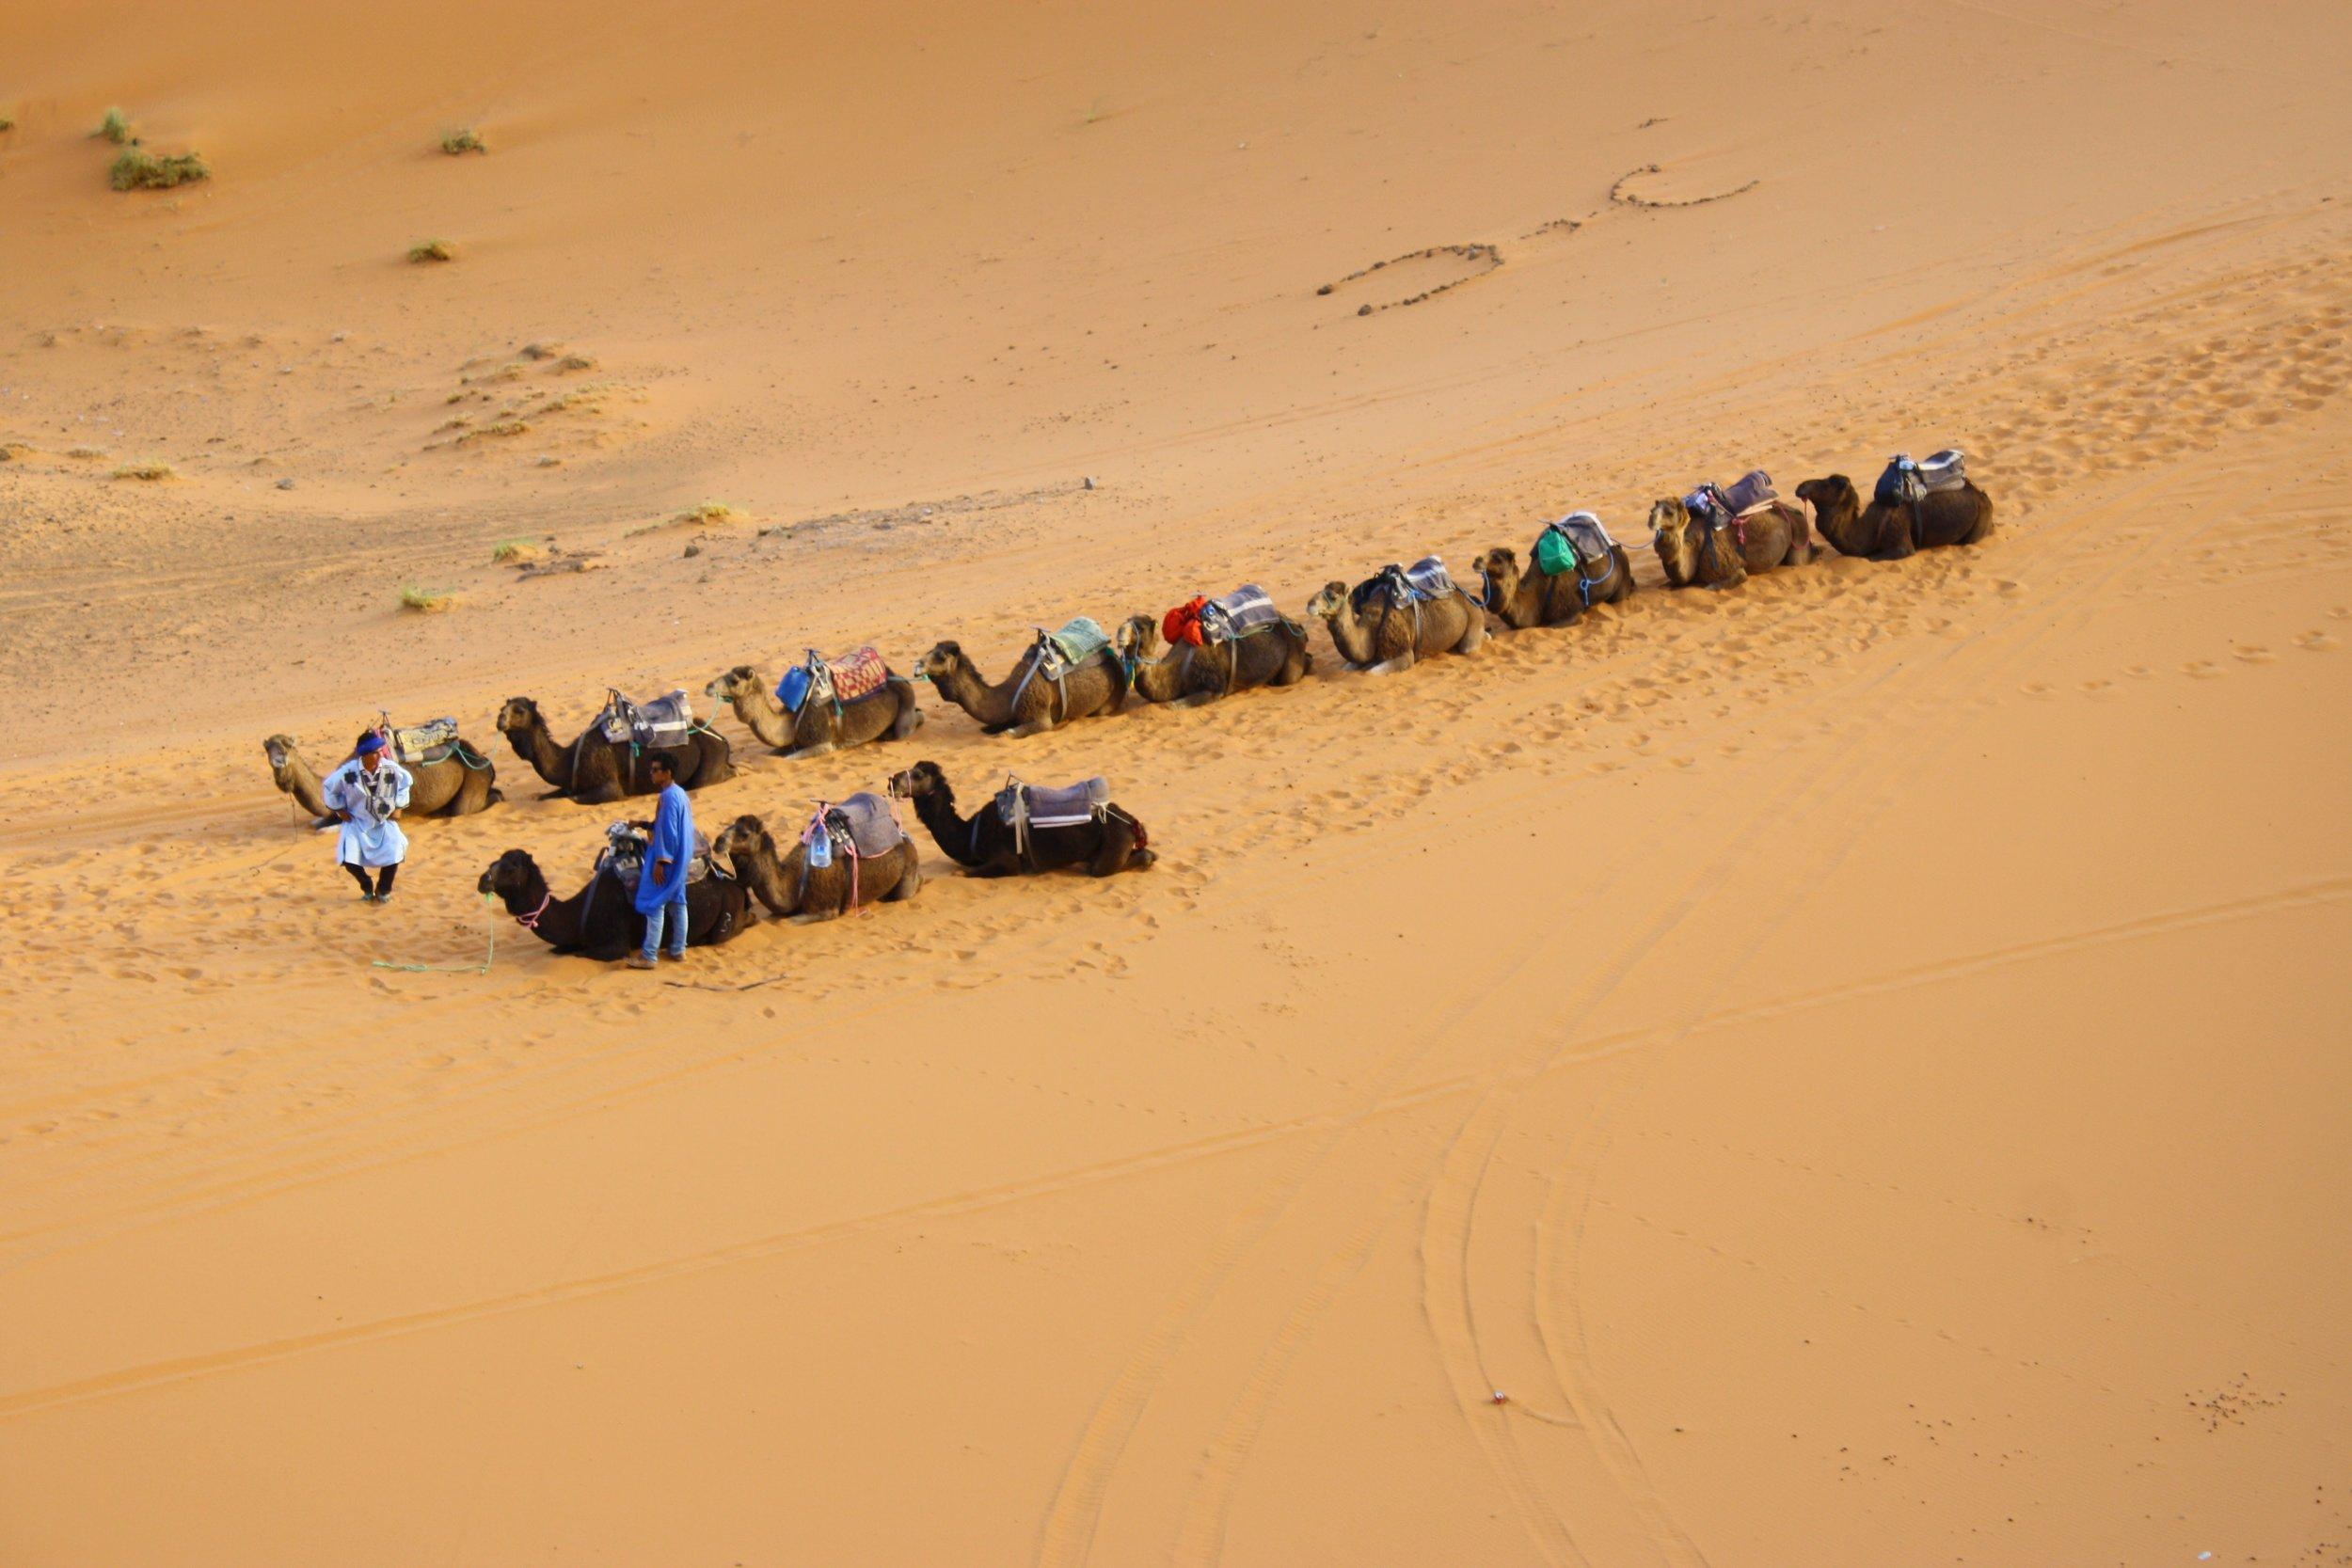 Morocco Photo by  Savvas Kalimeris  on  Unsplash